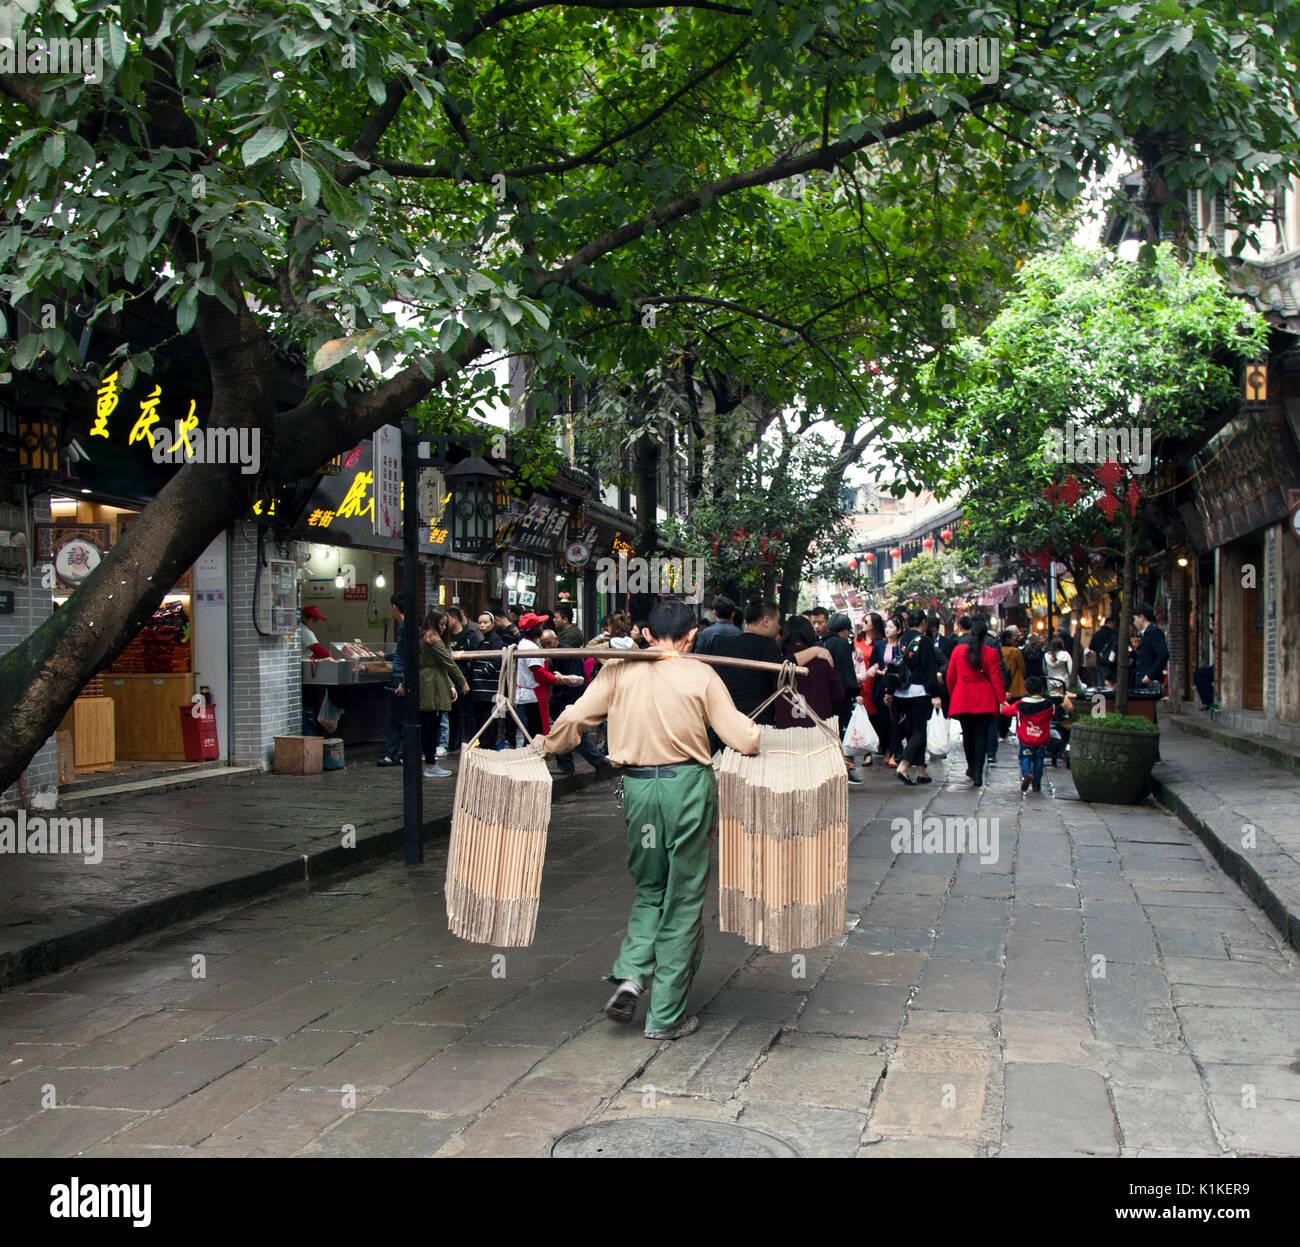 Coolie With Shoulder Yoke, Chongqing,  China. - Stock Image